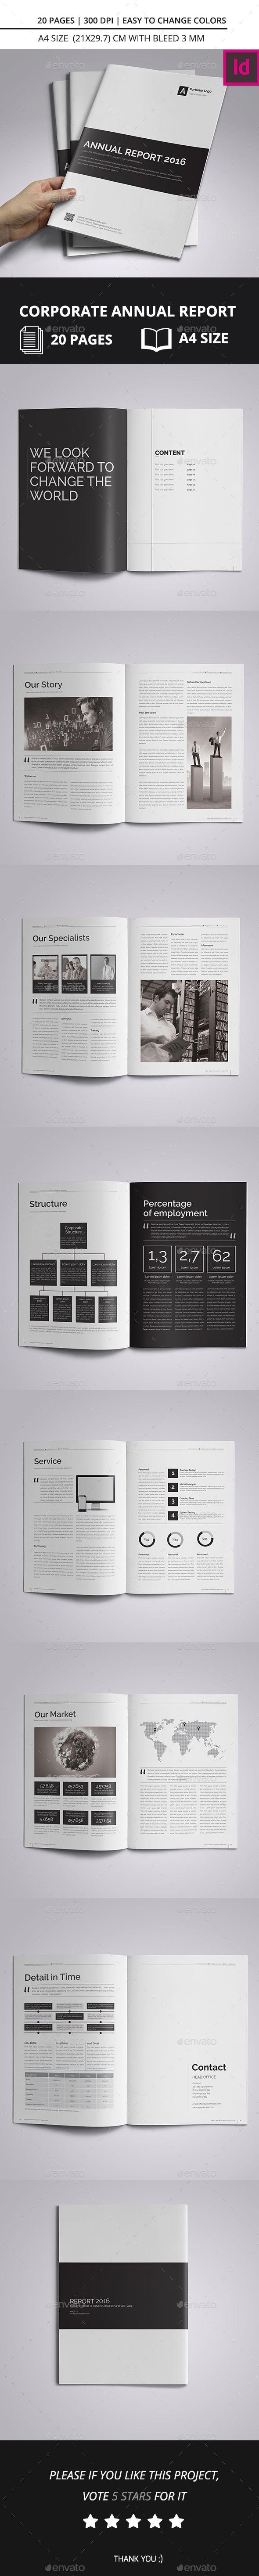 Corporate Annual Report Brochure 2016 A4